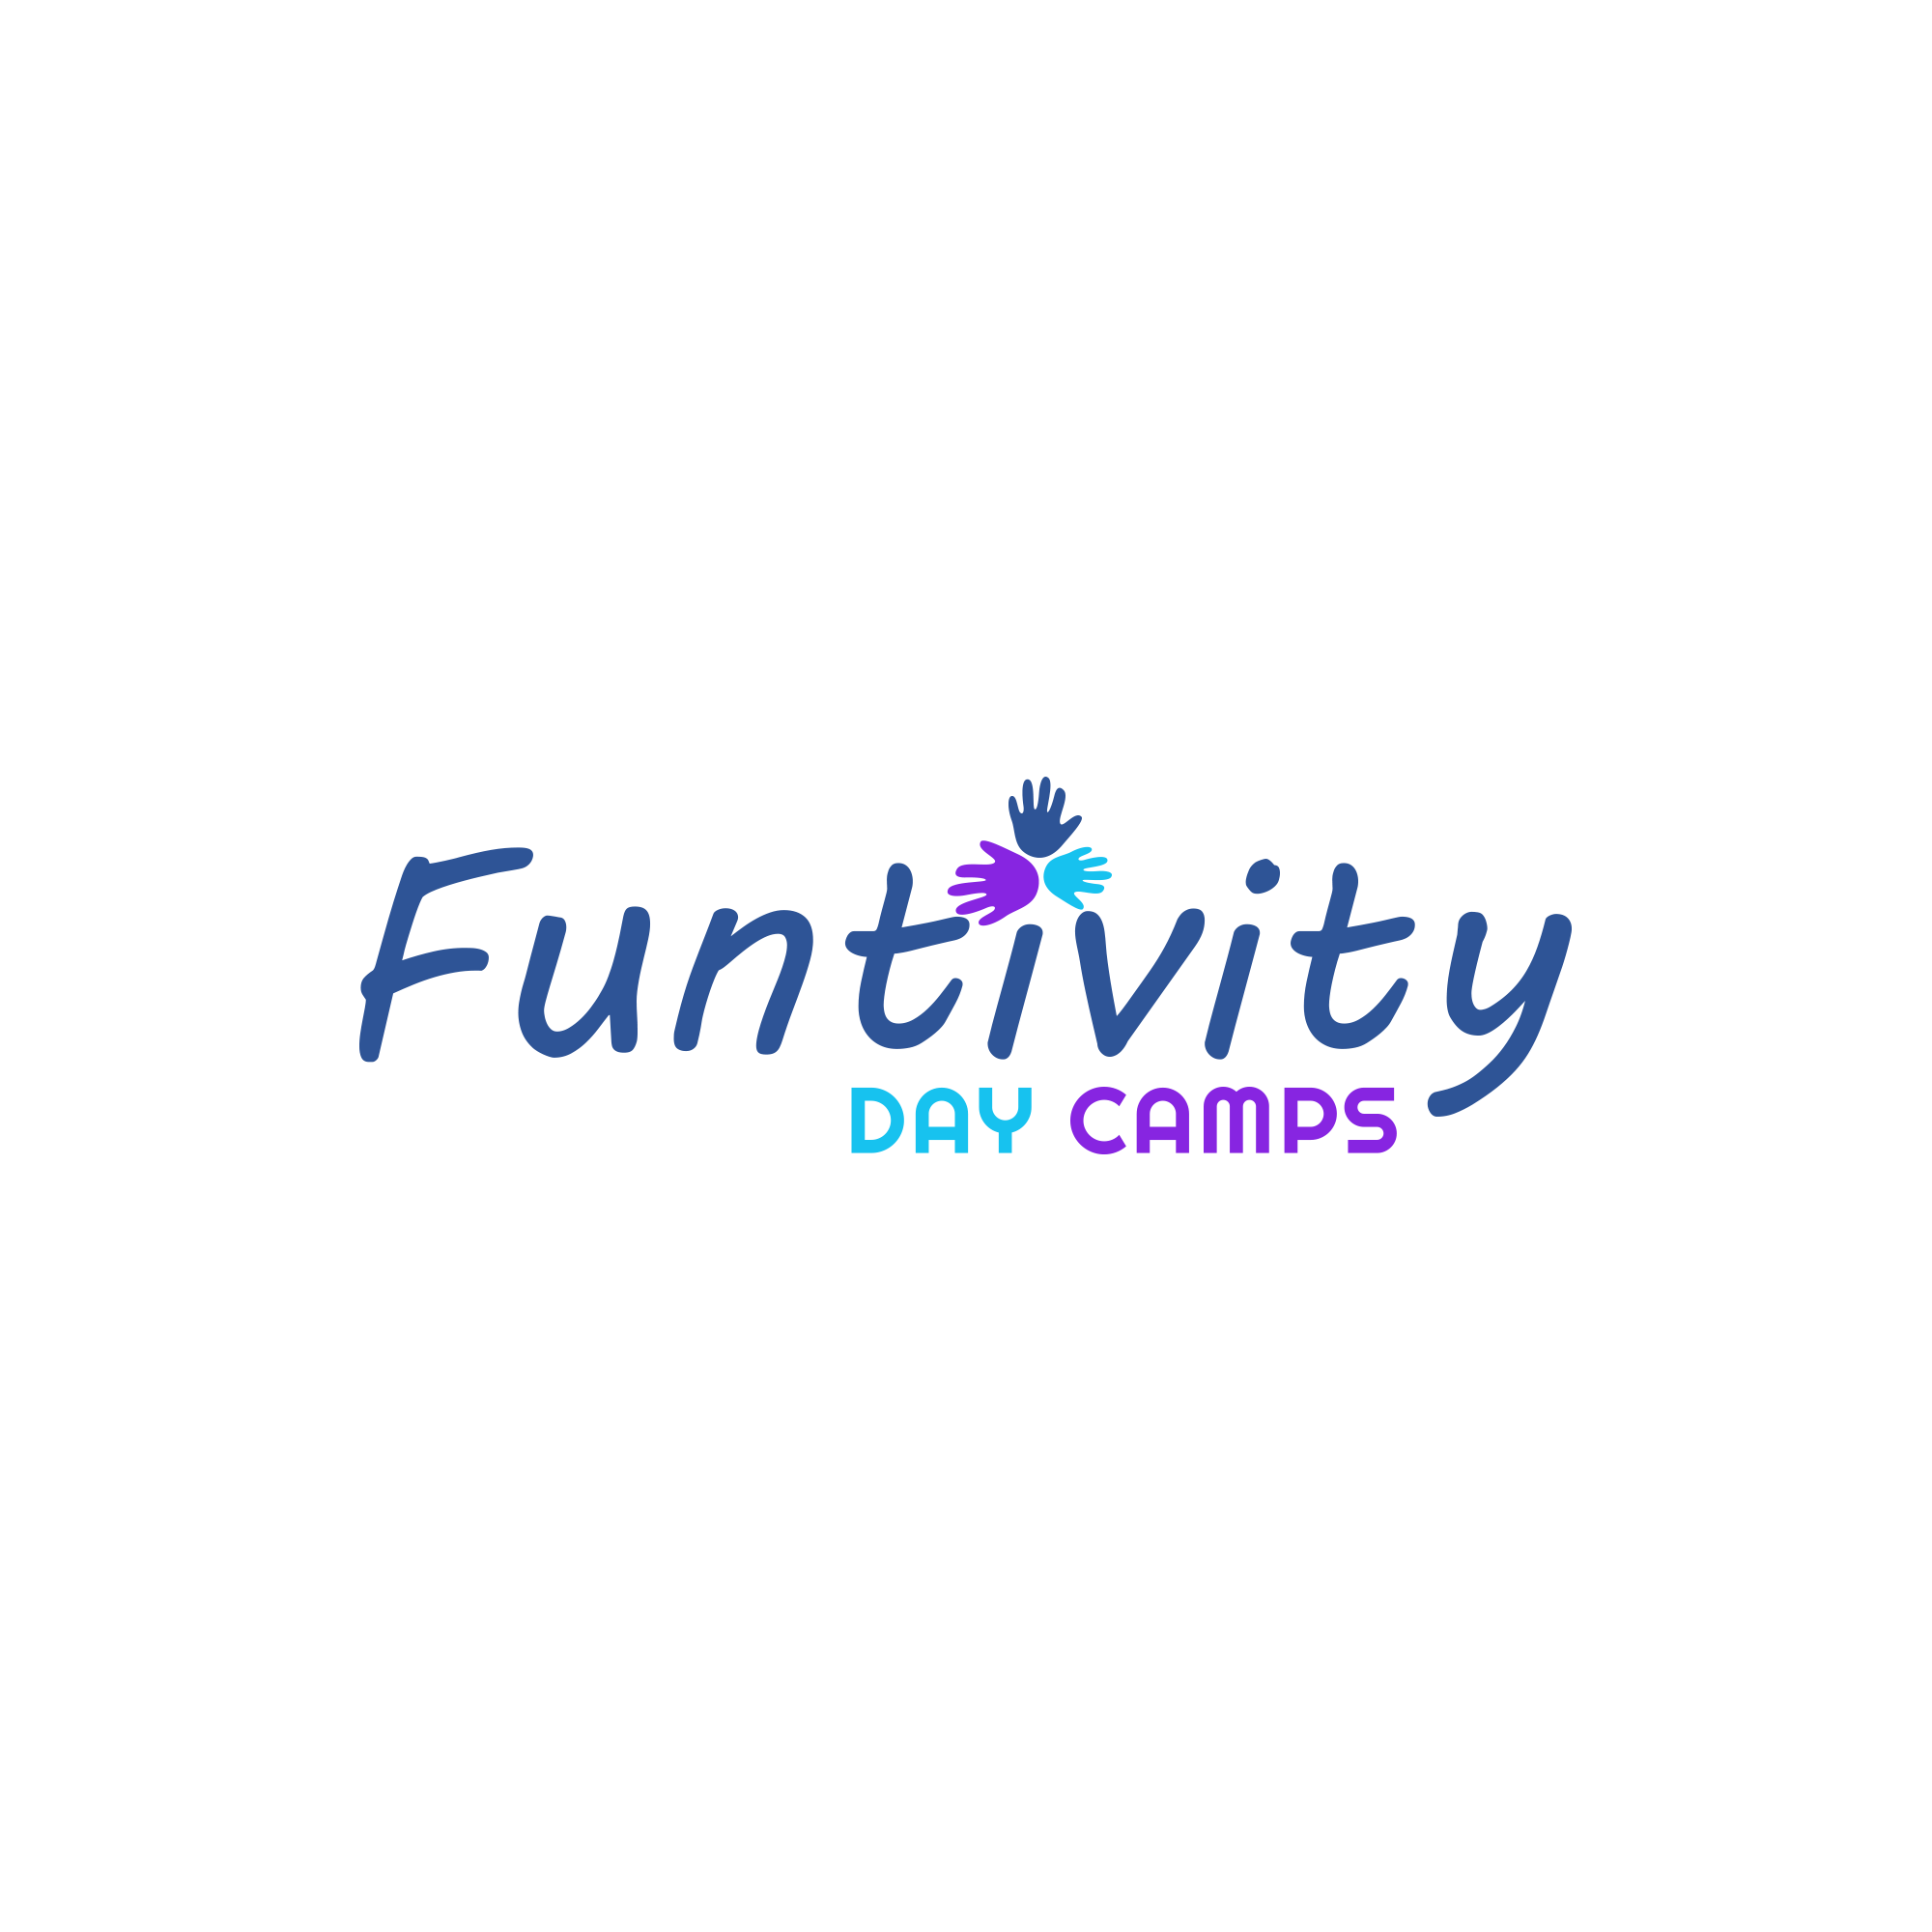 Funtivity Day Camps Ltd